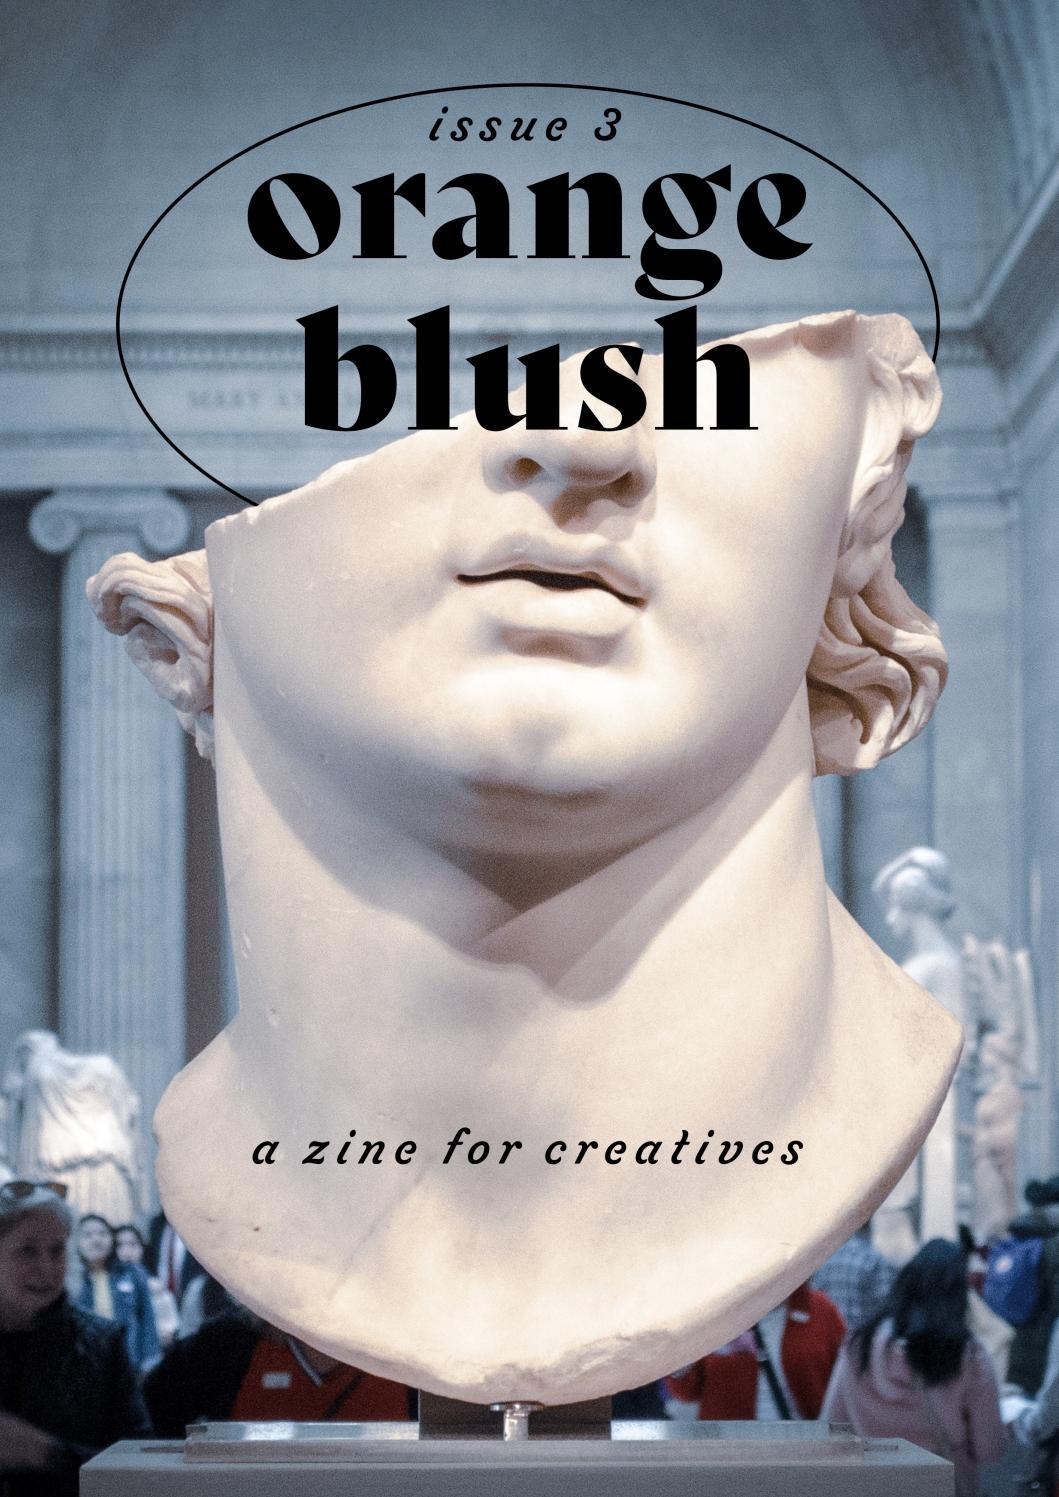 Orange Blush Zine │ Issue 25 / Nov '25 by orangeblushzine   issuu